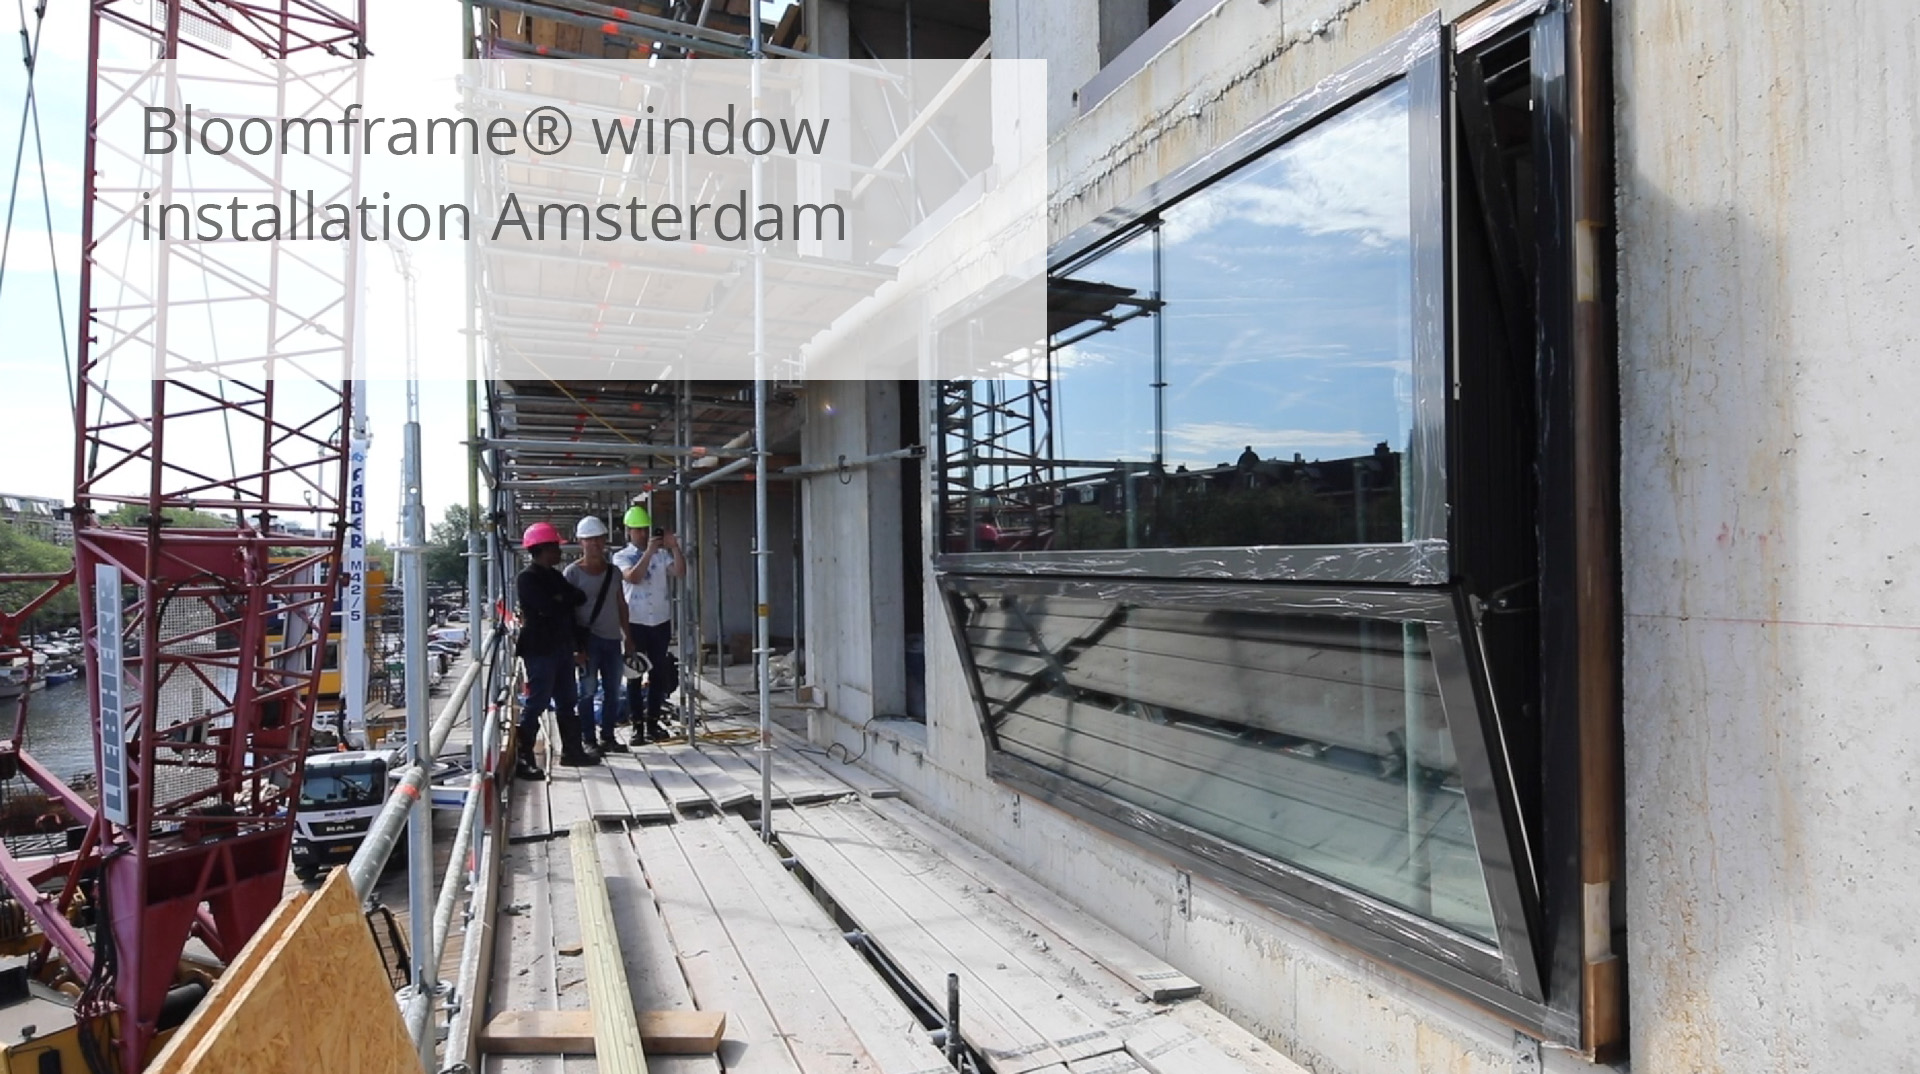 Bloomframe® window installation